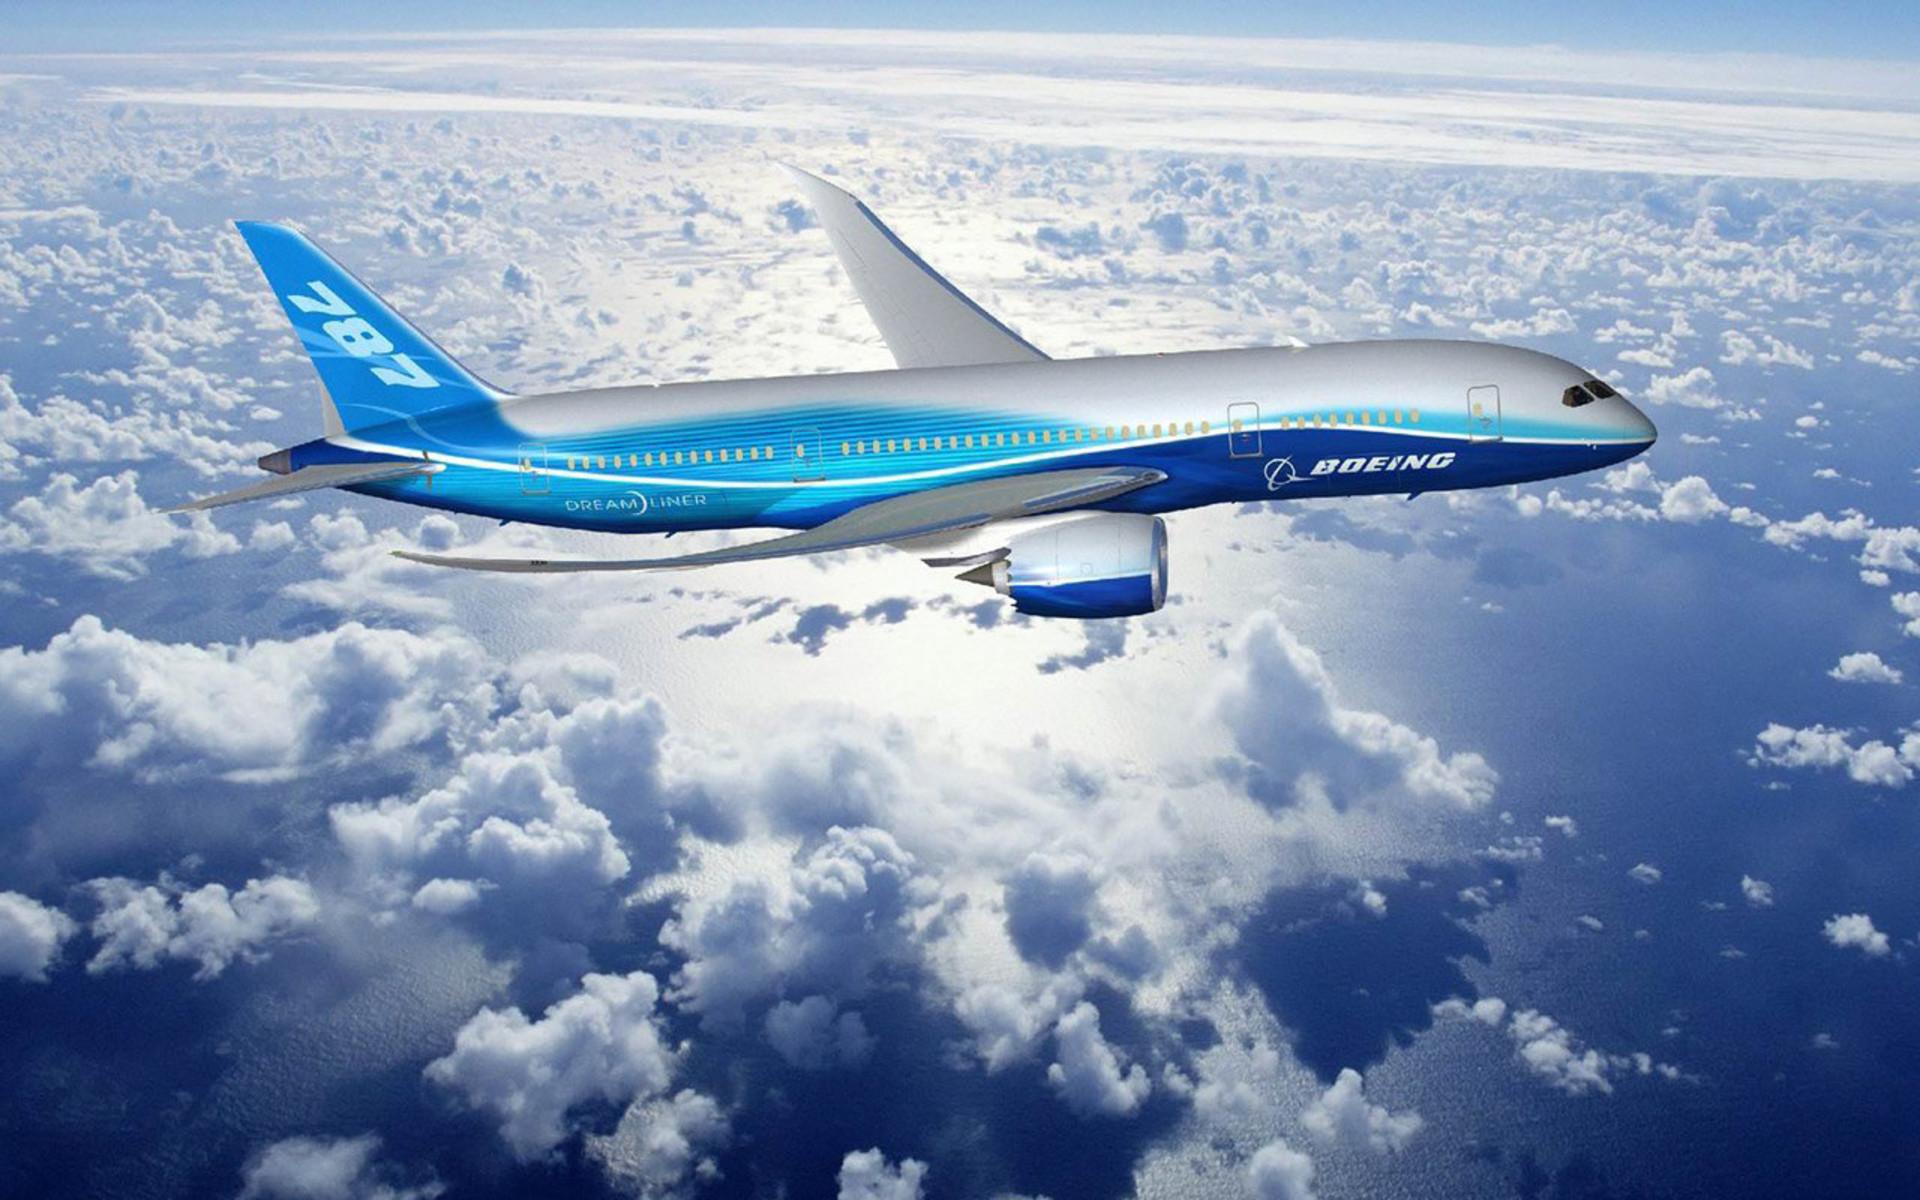 Boeing 787 Dreamliner Fondo De Pantalla Hd Fondo De